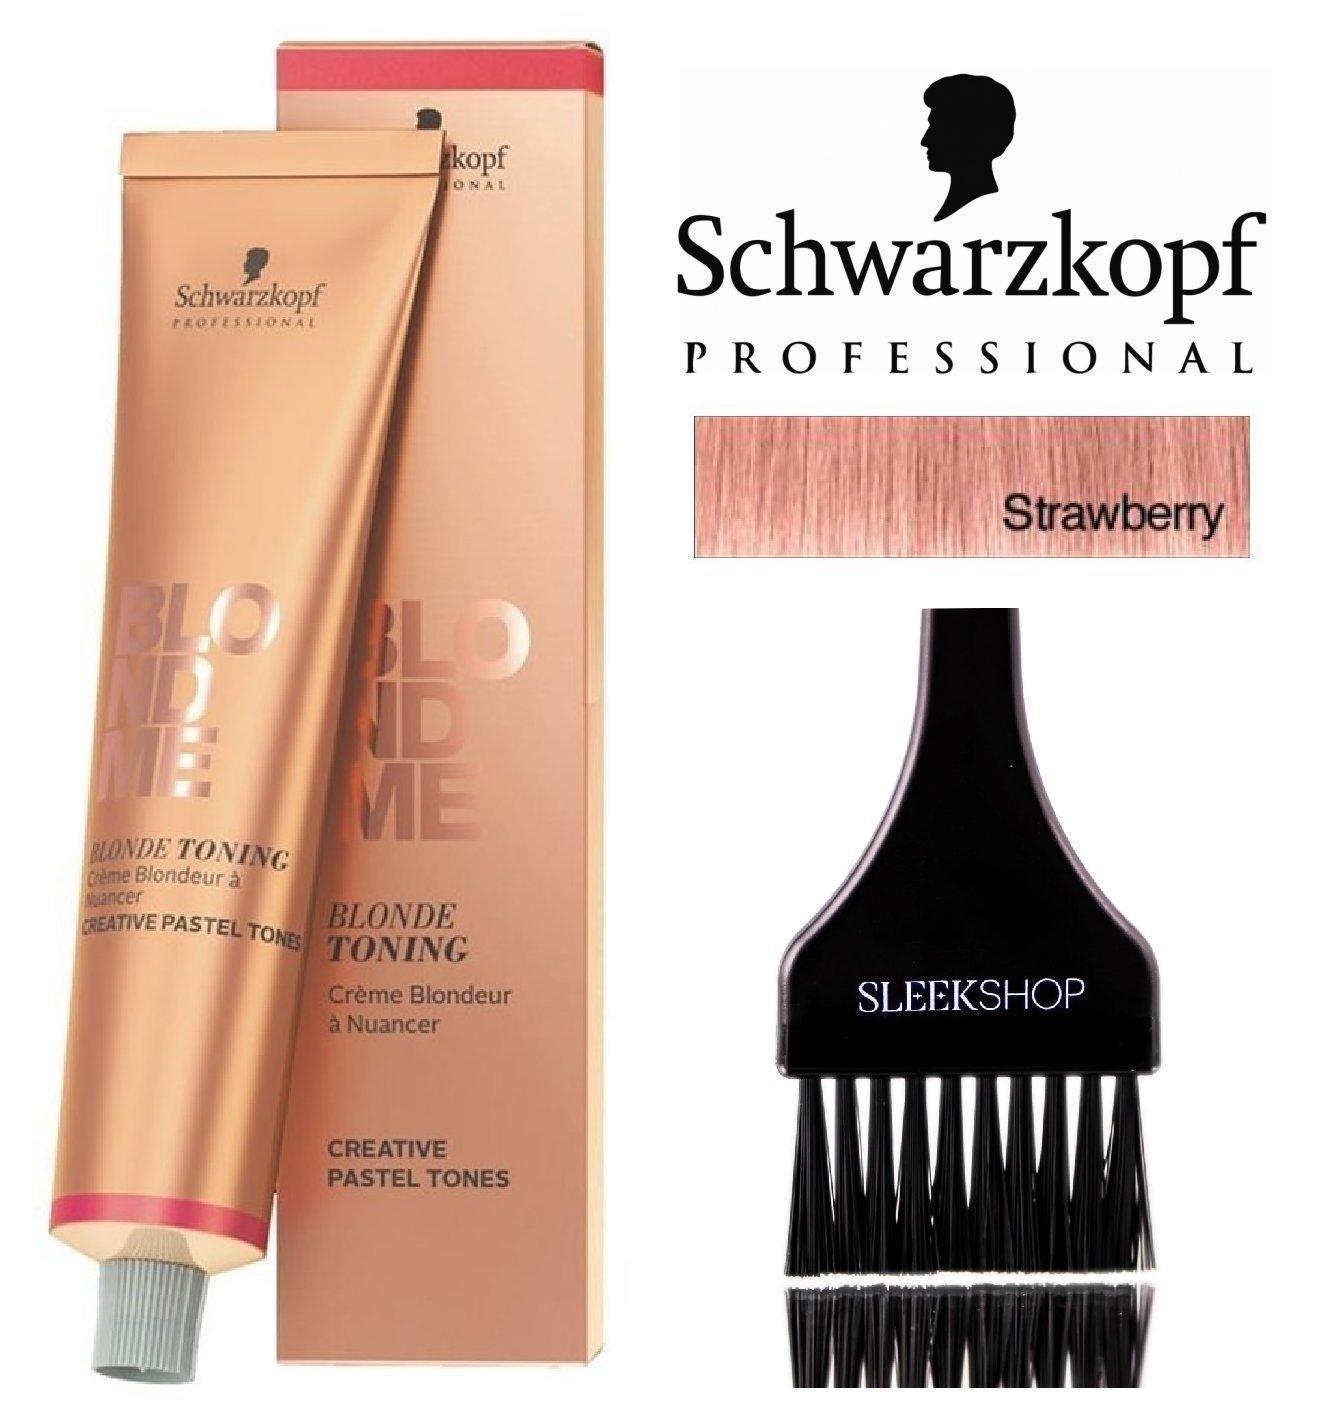 Details About Schwarzkopf Professional Blond Me Blonde Toning Strawberry W Sleek Brush 2oz